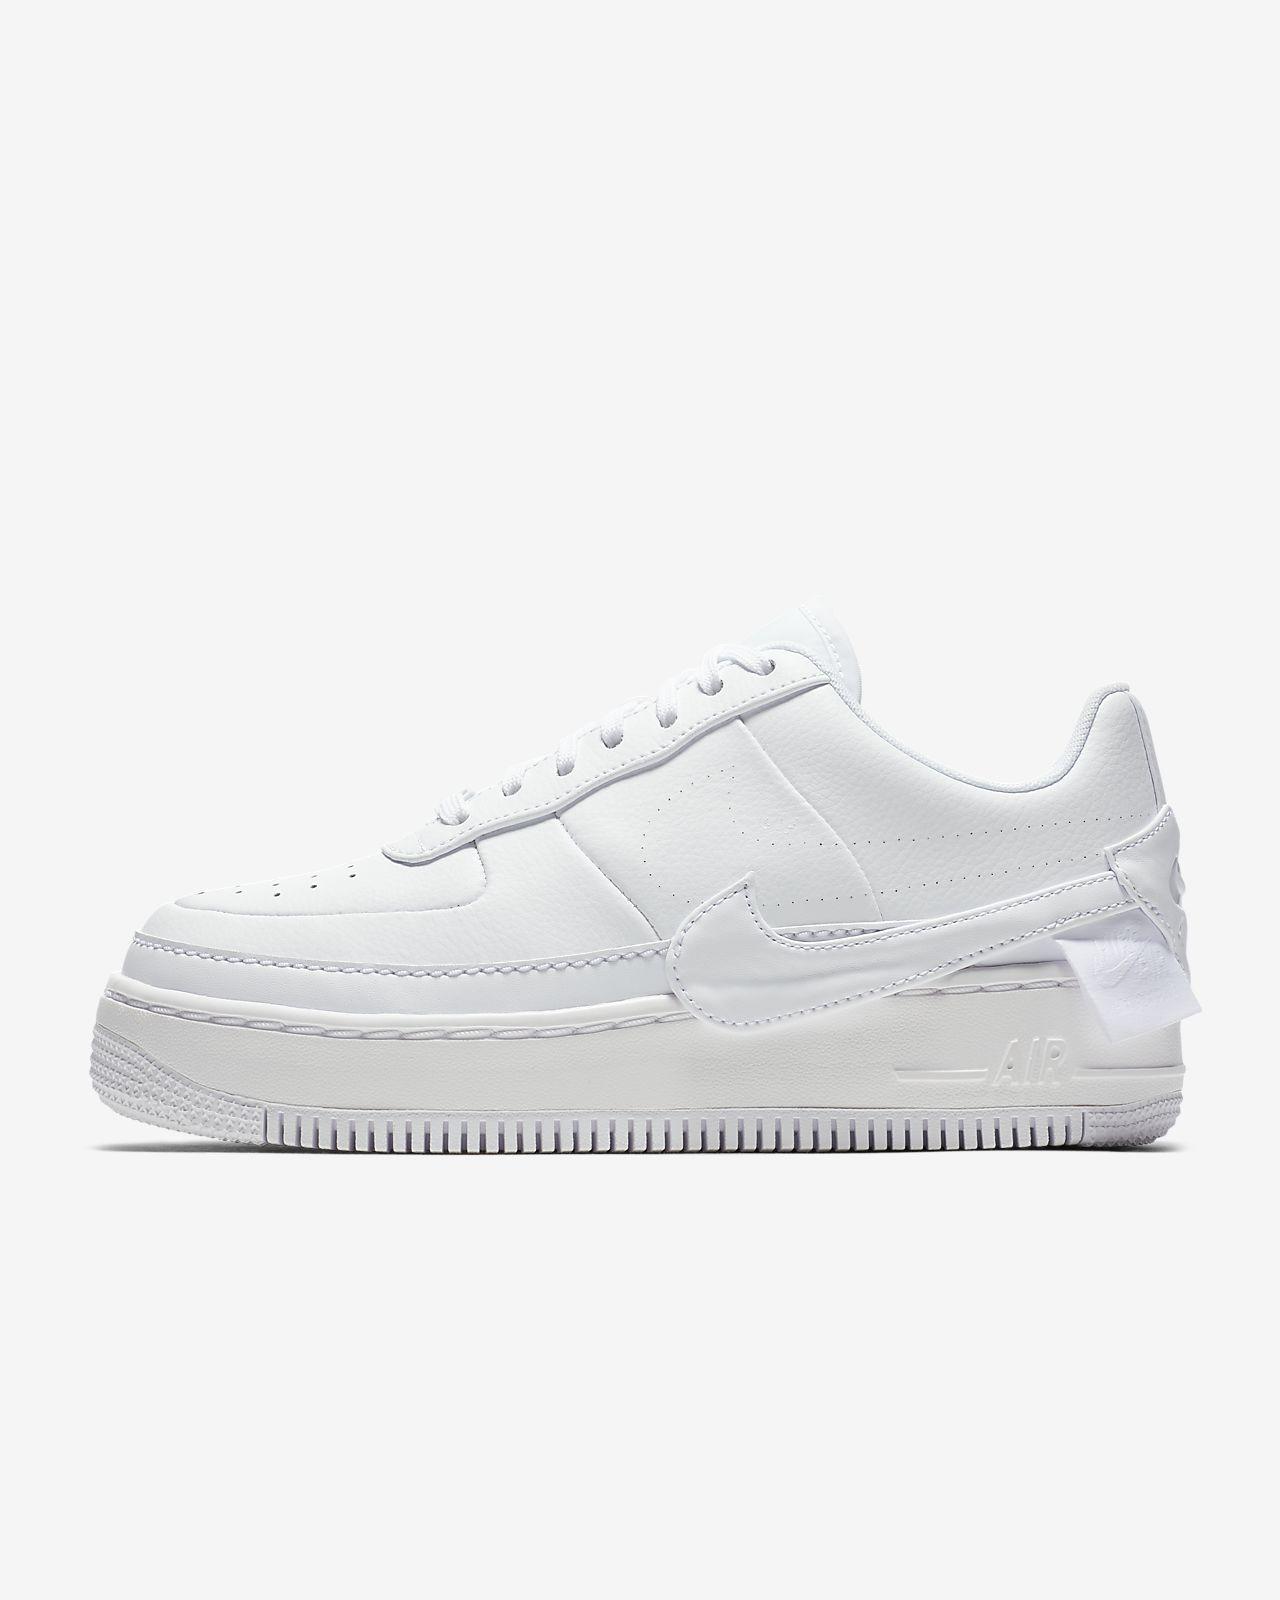 Nike Air Force 1 Jester XX 鞋款